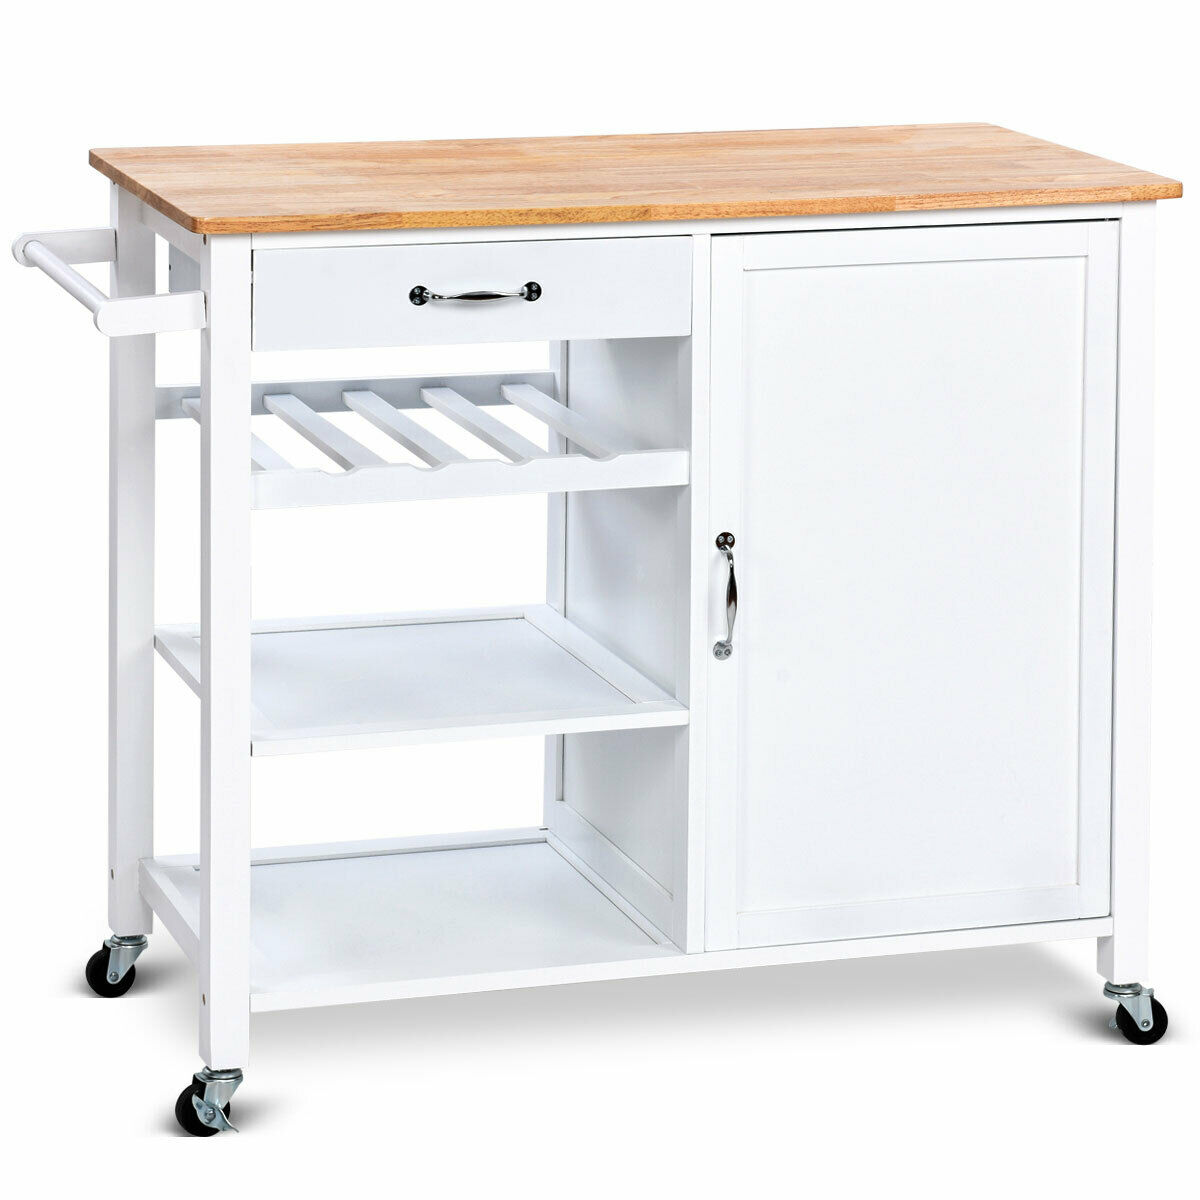 Gymax 4-Tier Wood Kitchen Trolley Cart Island Storage ...